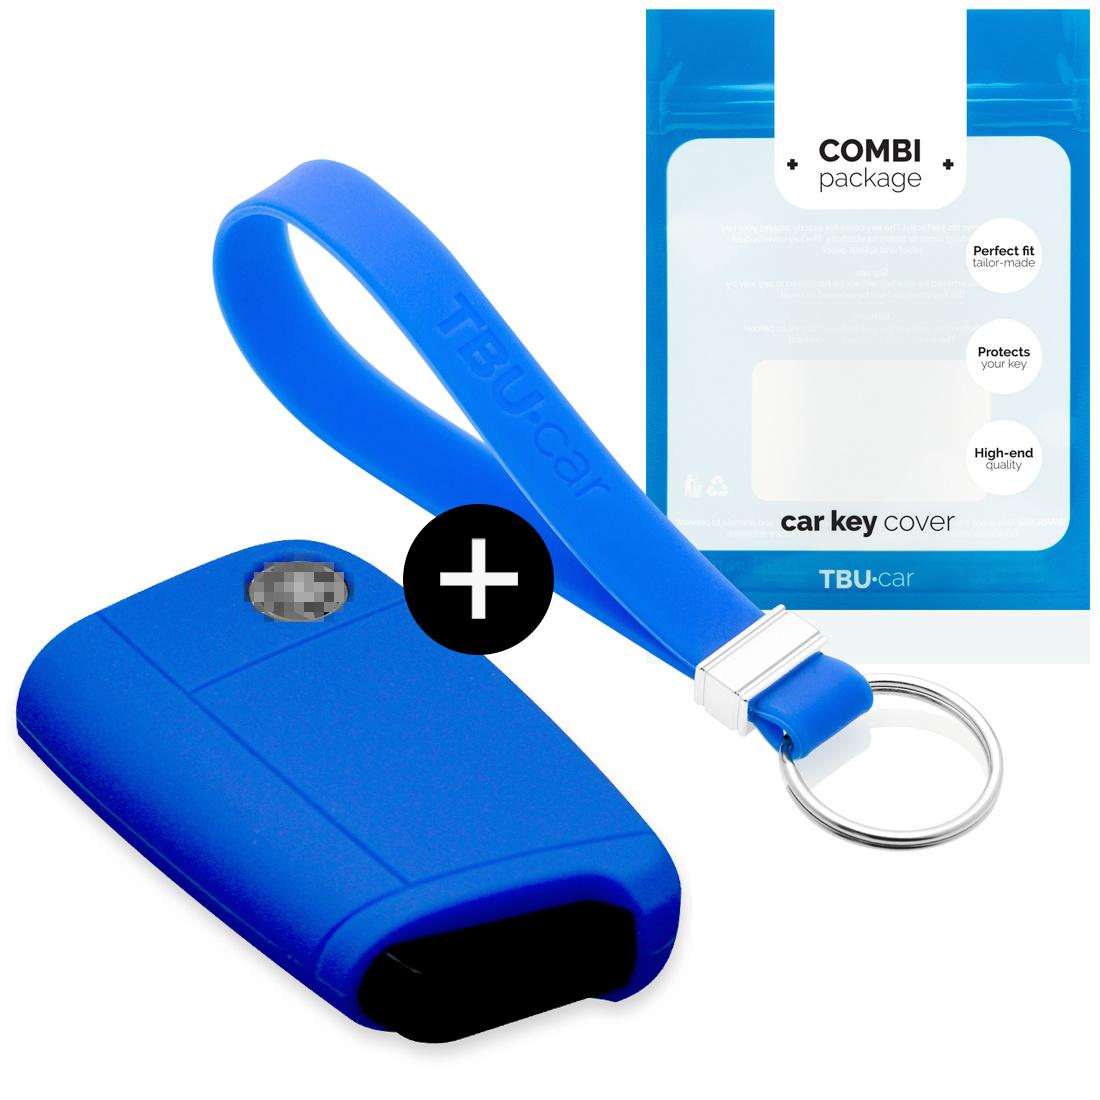 Skoda Autoschlüssel Hülle - Silikon Schutzhülle - Schlüsselhülle Cover - Blau